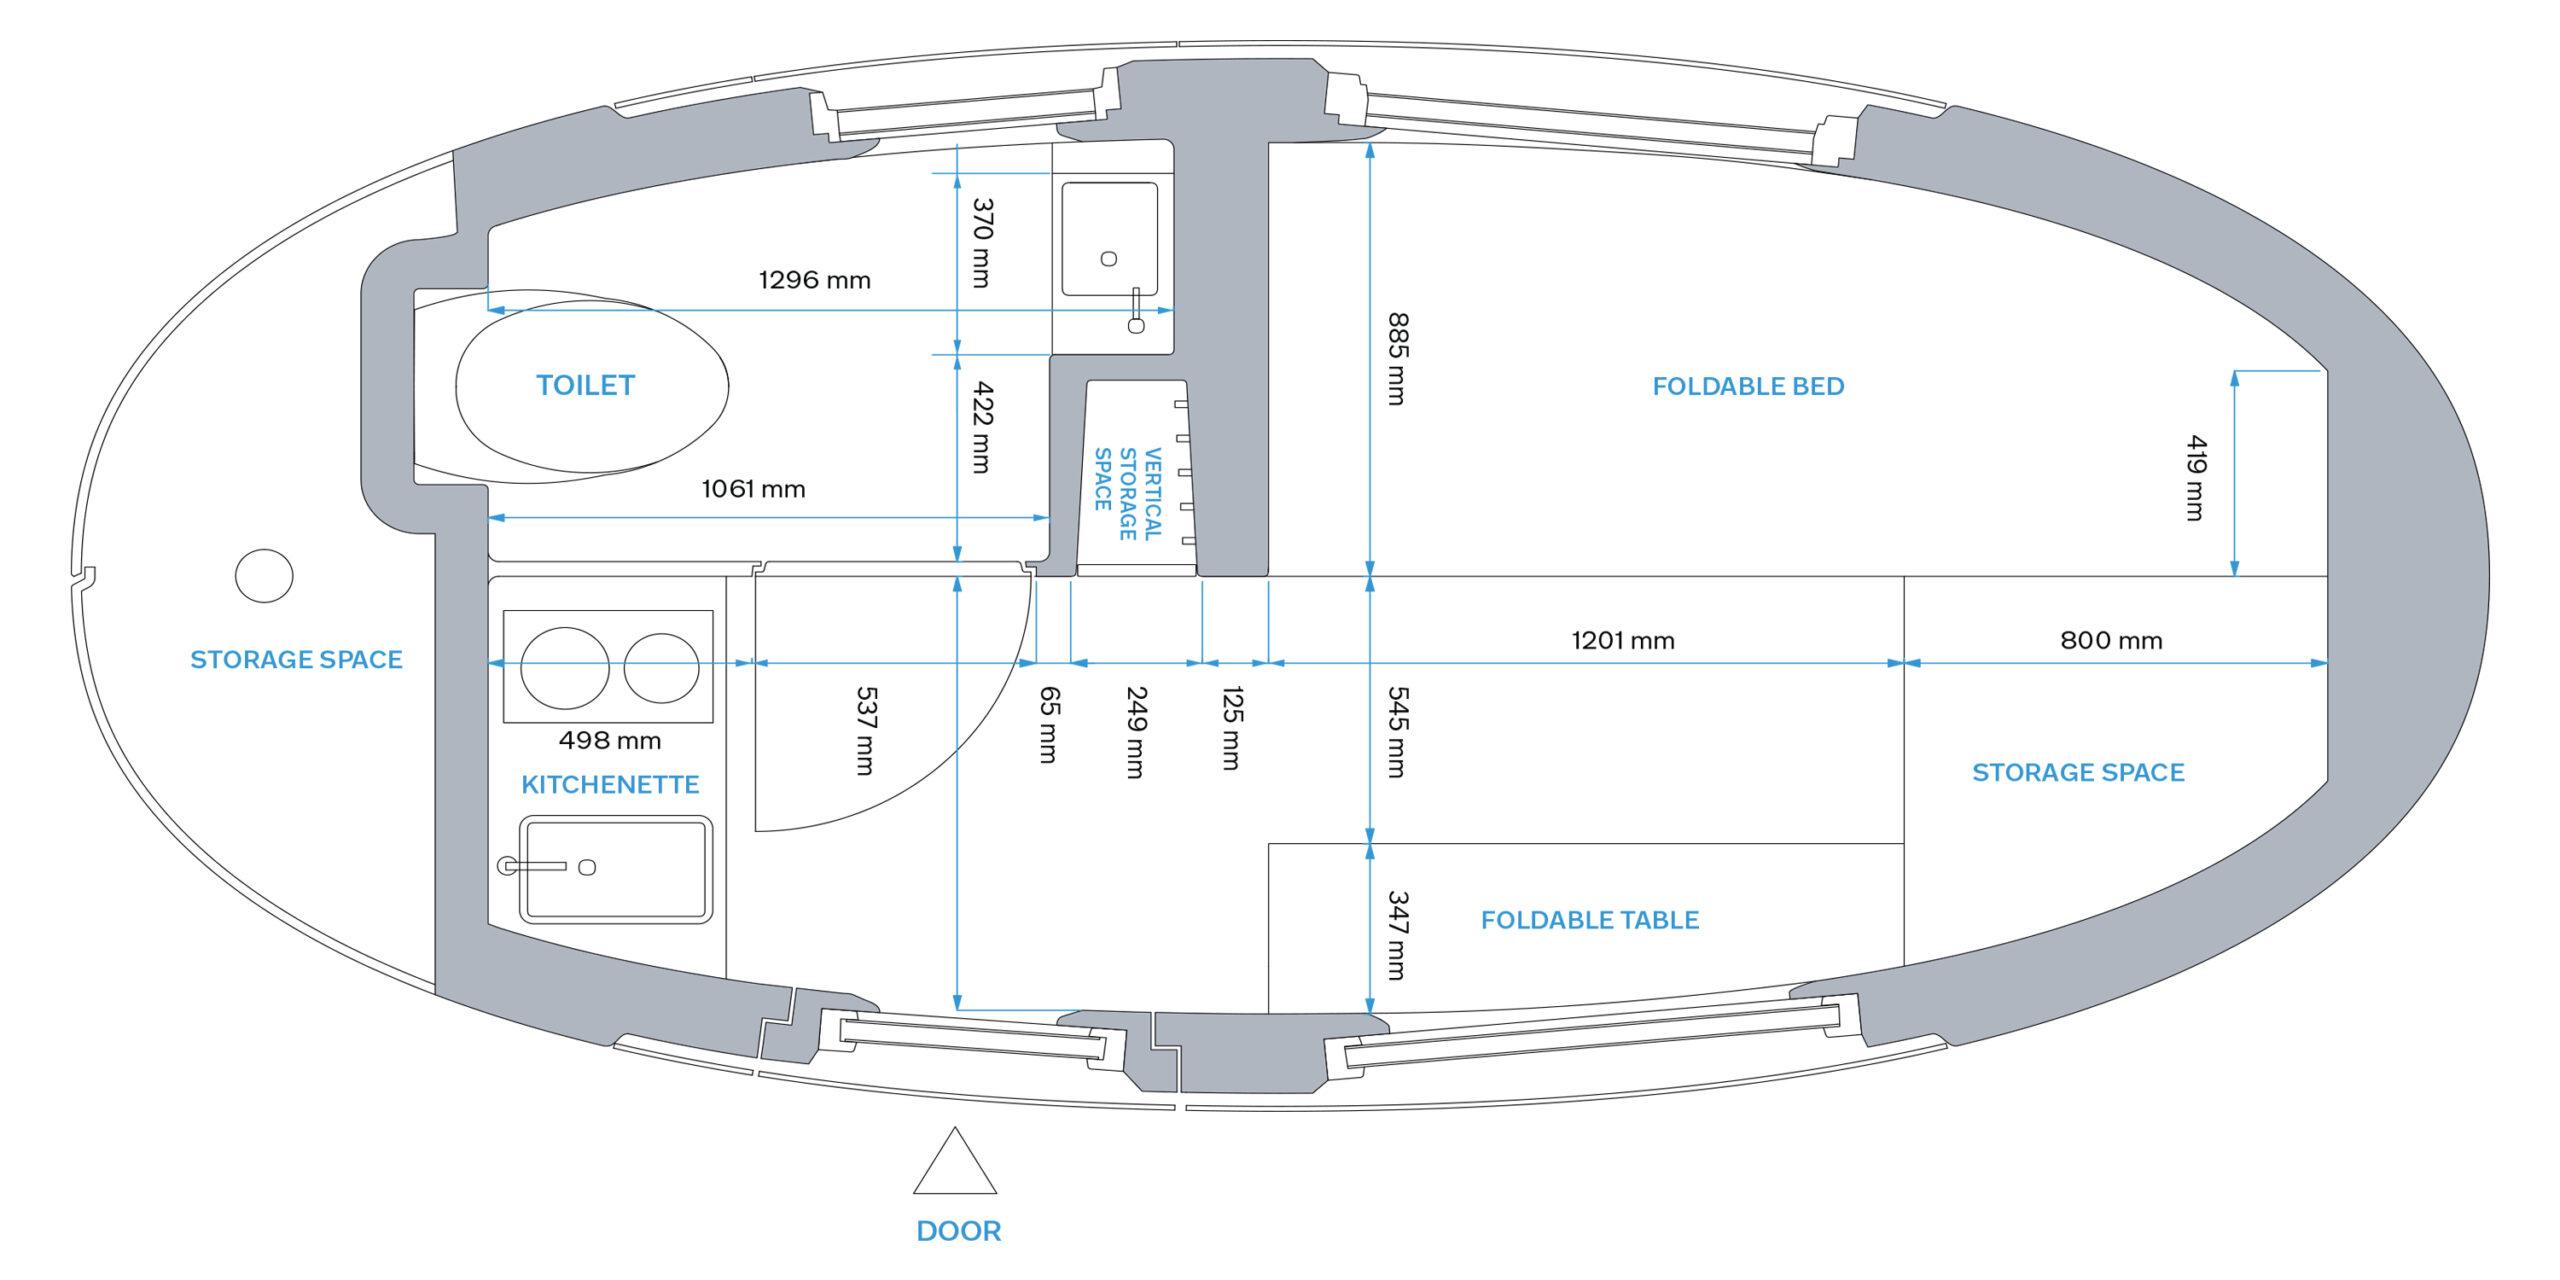 Floorplan Eng Metric A4 Vysedene Steny